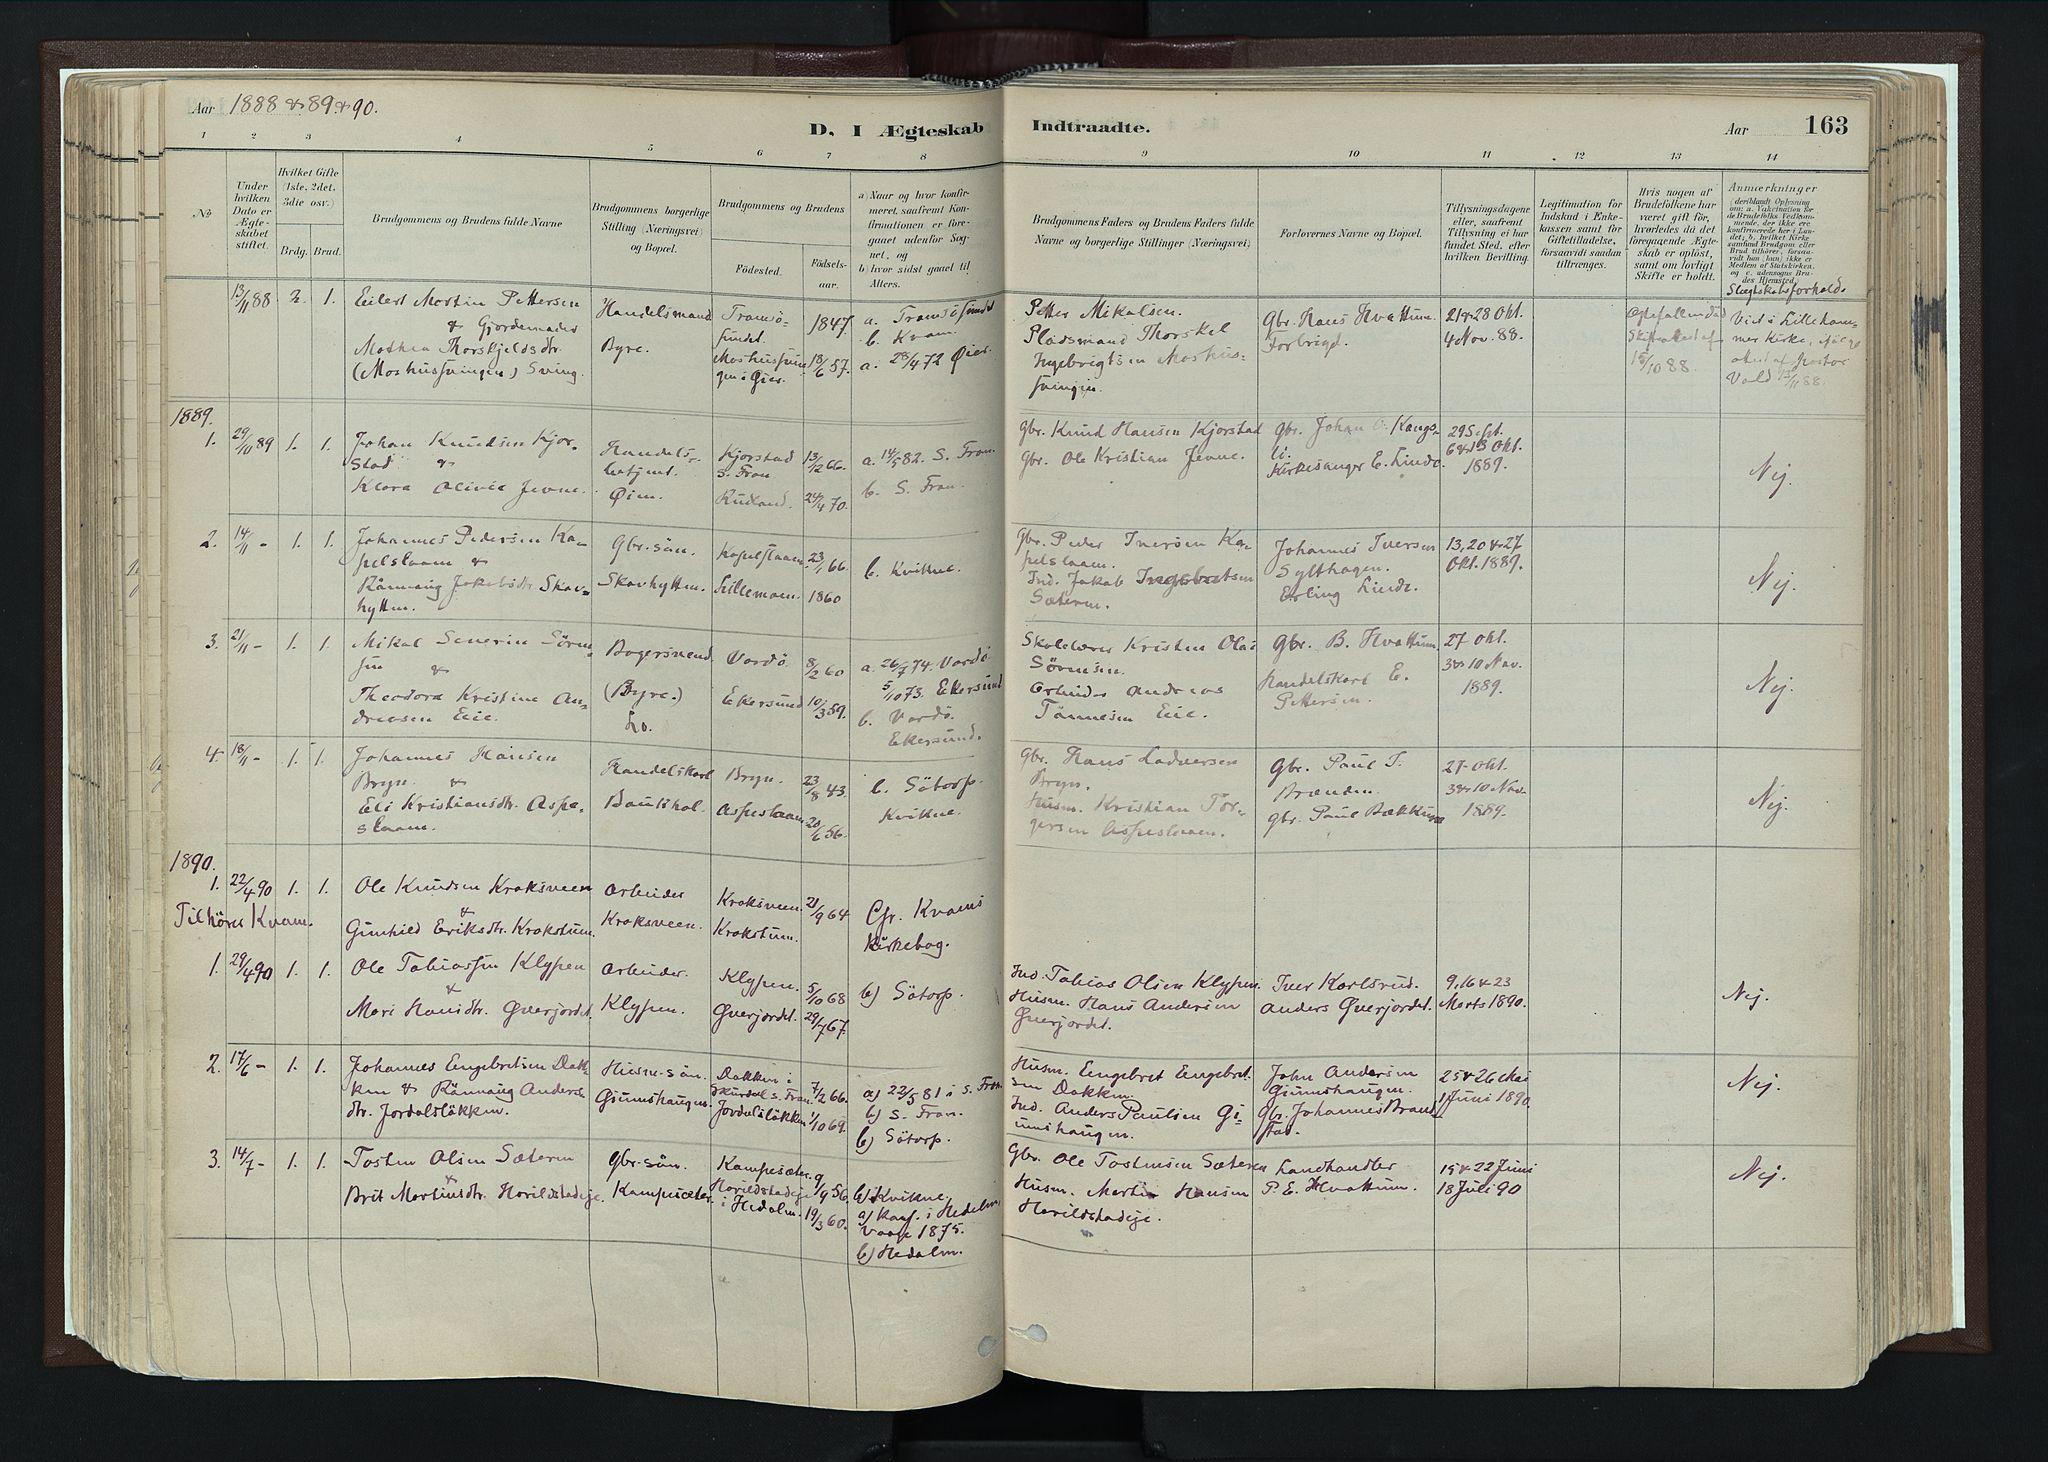 SAH, Nord-Fron prestekontor, Ministerialbok nr. 4, 1884-1914, s. 163